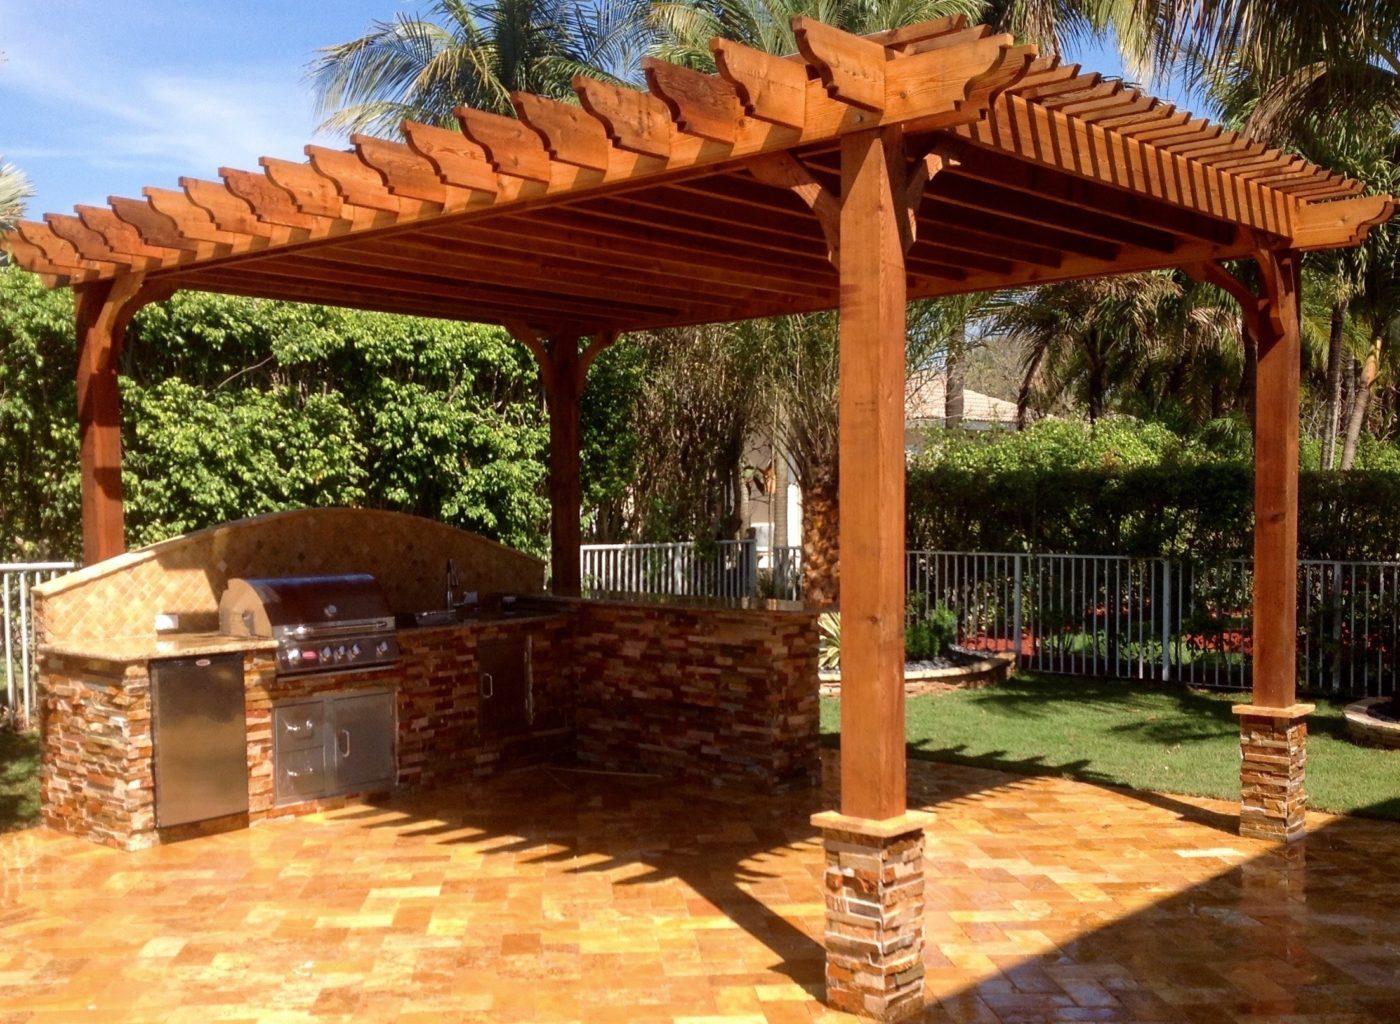 Backyard Renovation Pompano Beach, FL | Pool & Patio Design on Backyard Renovations Cost id=46331